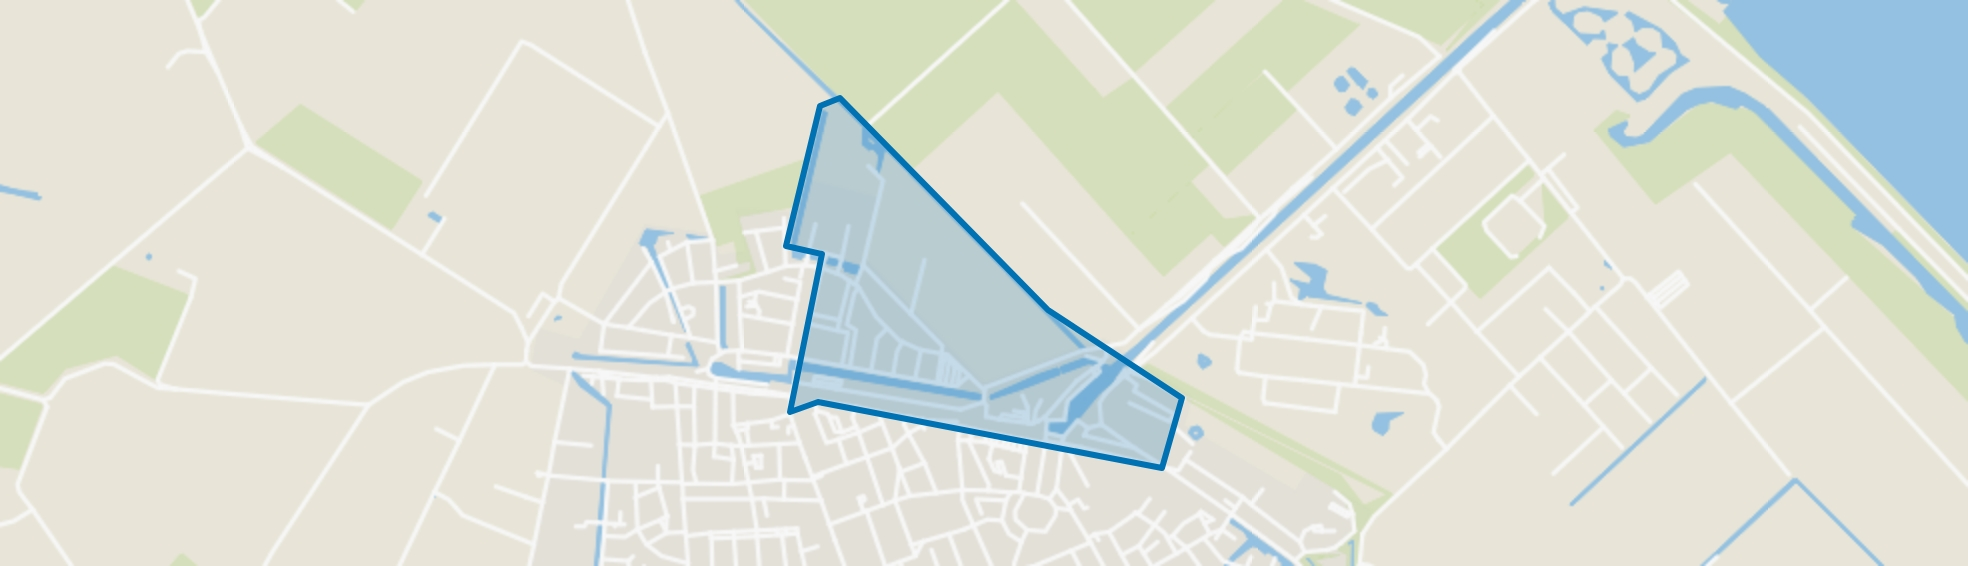 Middelharnis westplaat, Middelharnis map